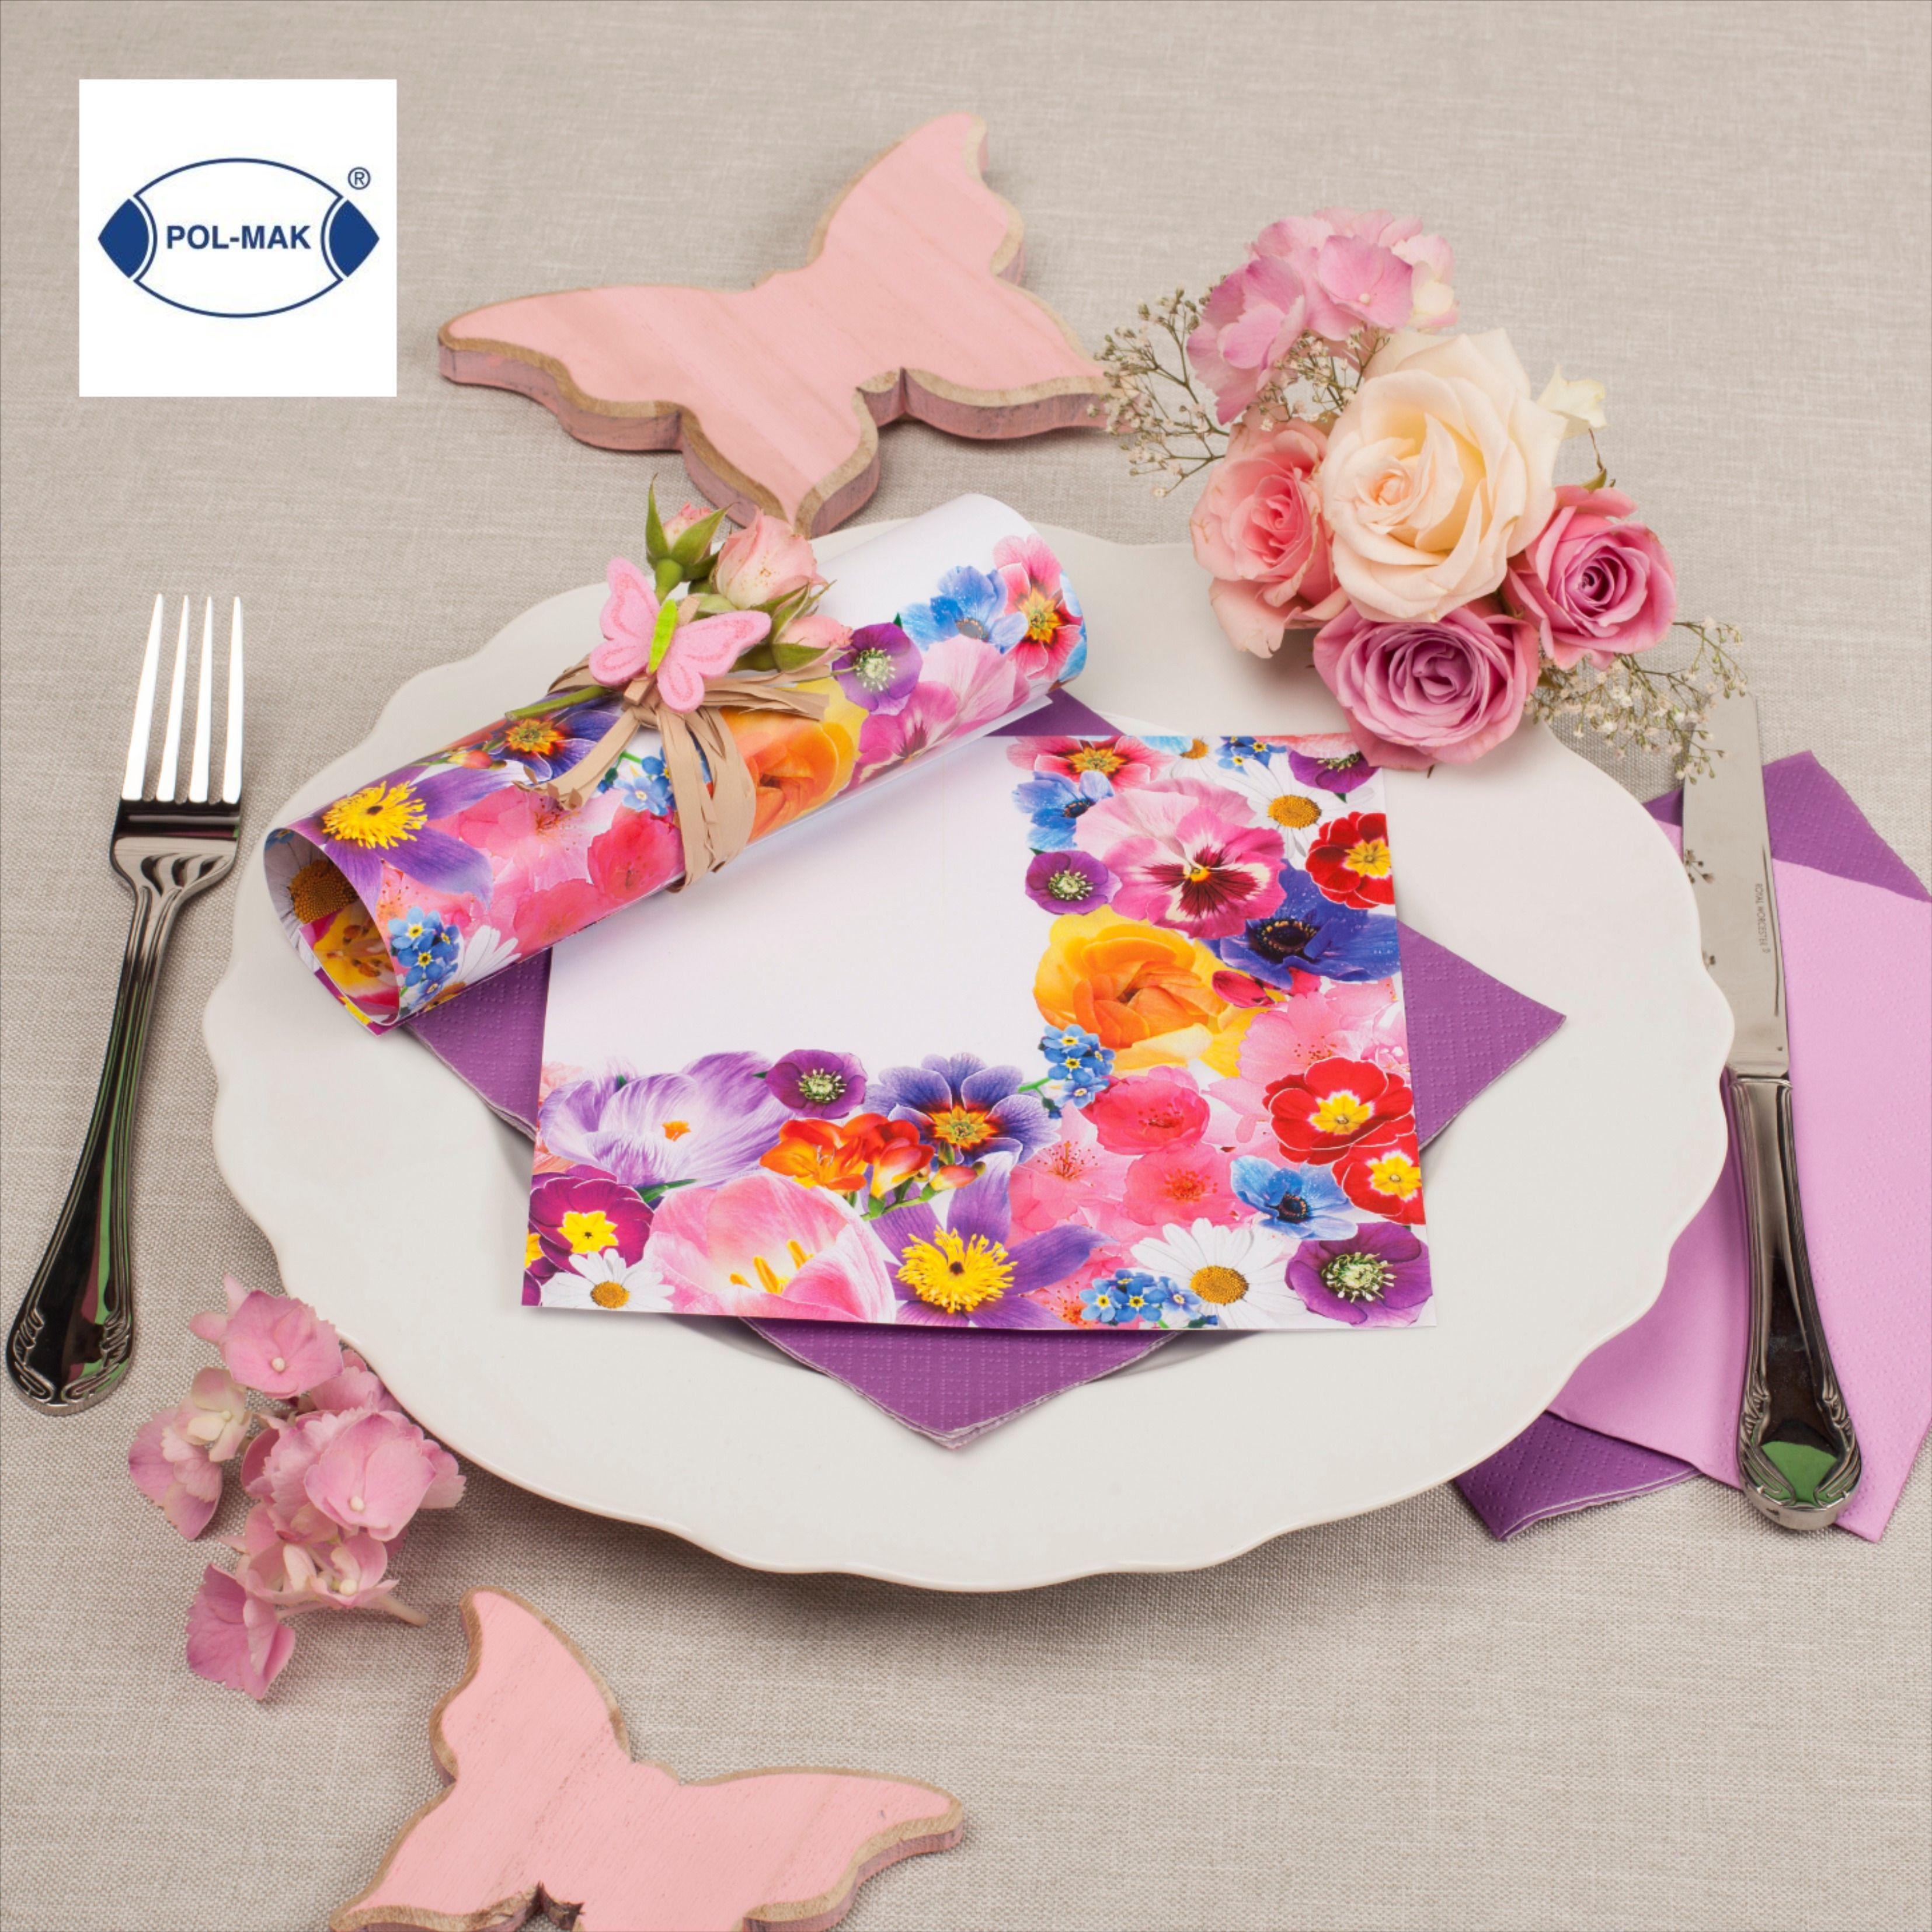 Decorative Print Paper Spring Flowers Napkin From Pol Mak Poland In 2020 Decorative Prints Spring Flowers Napkins